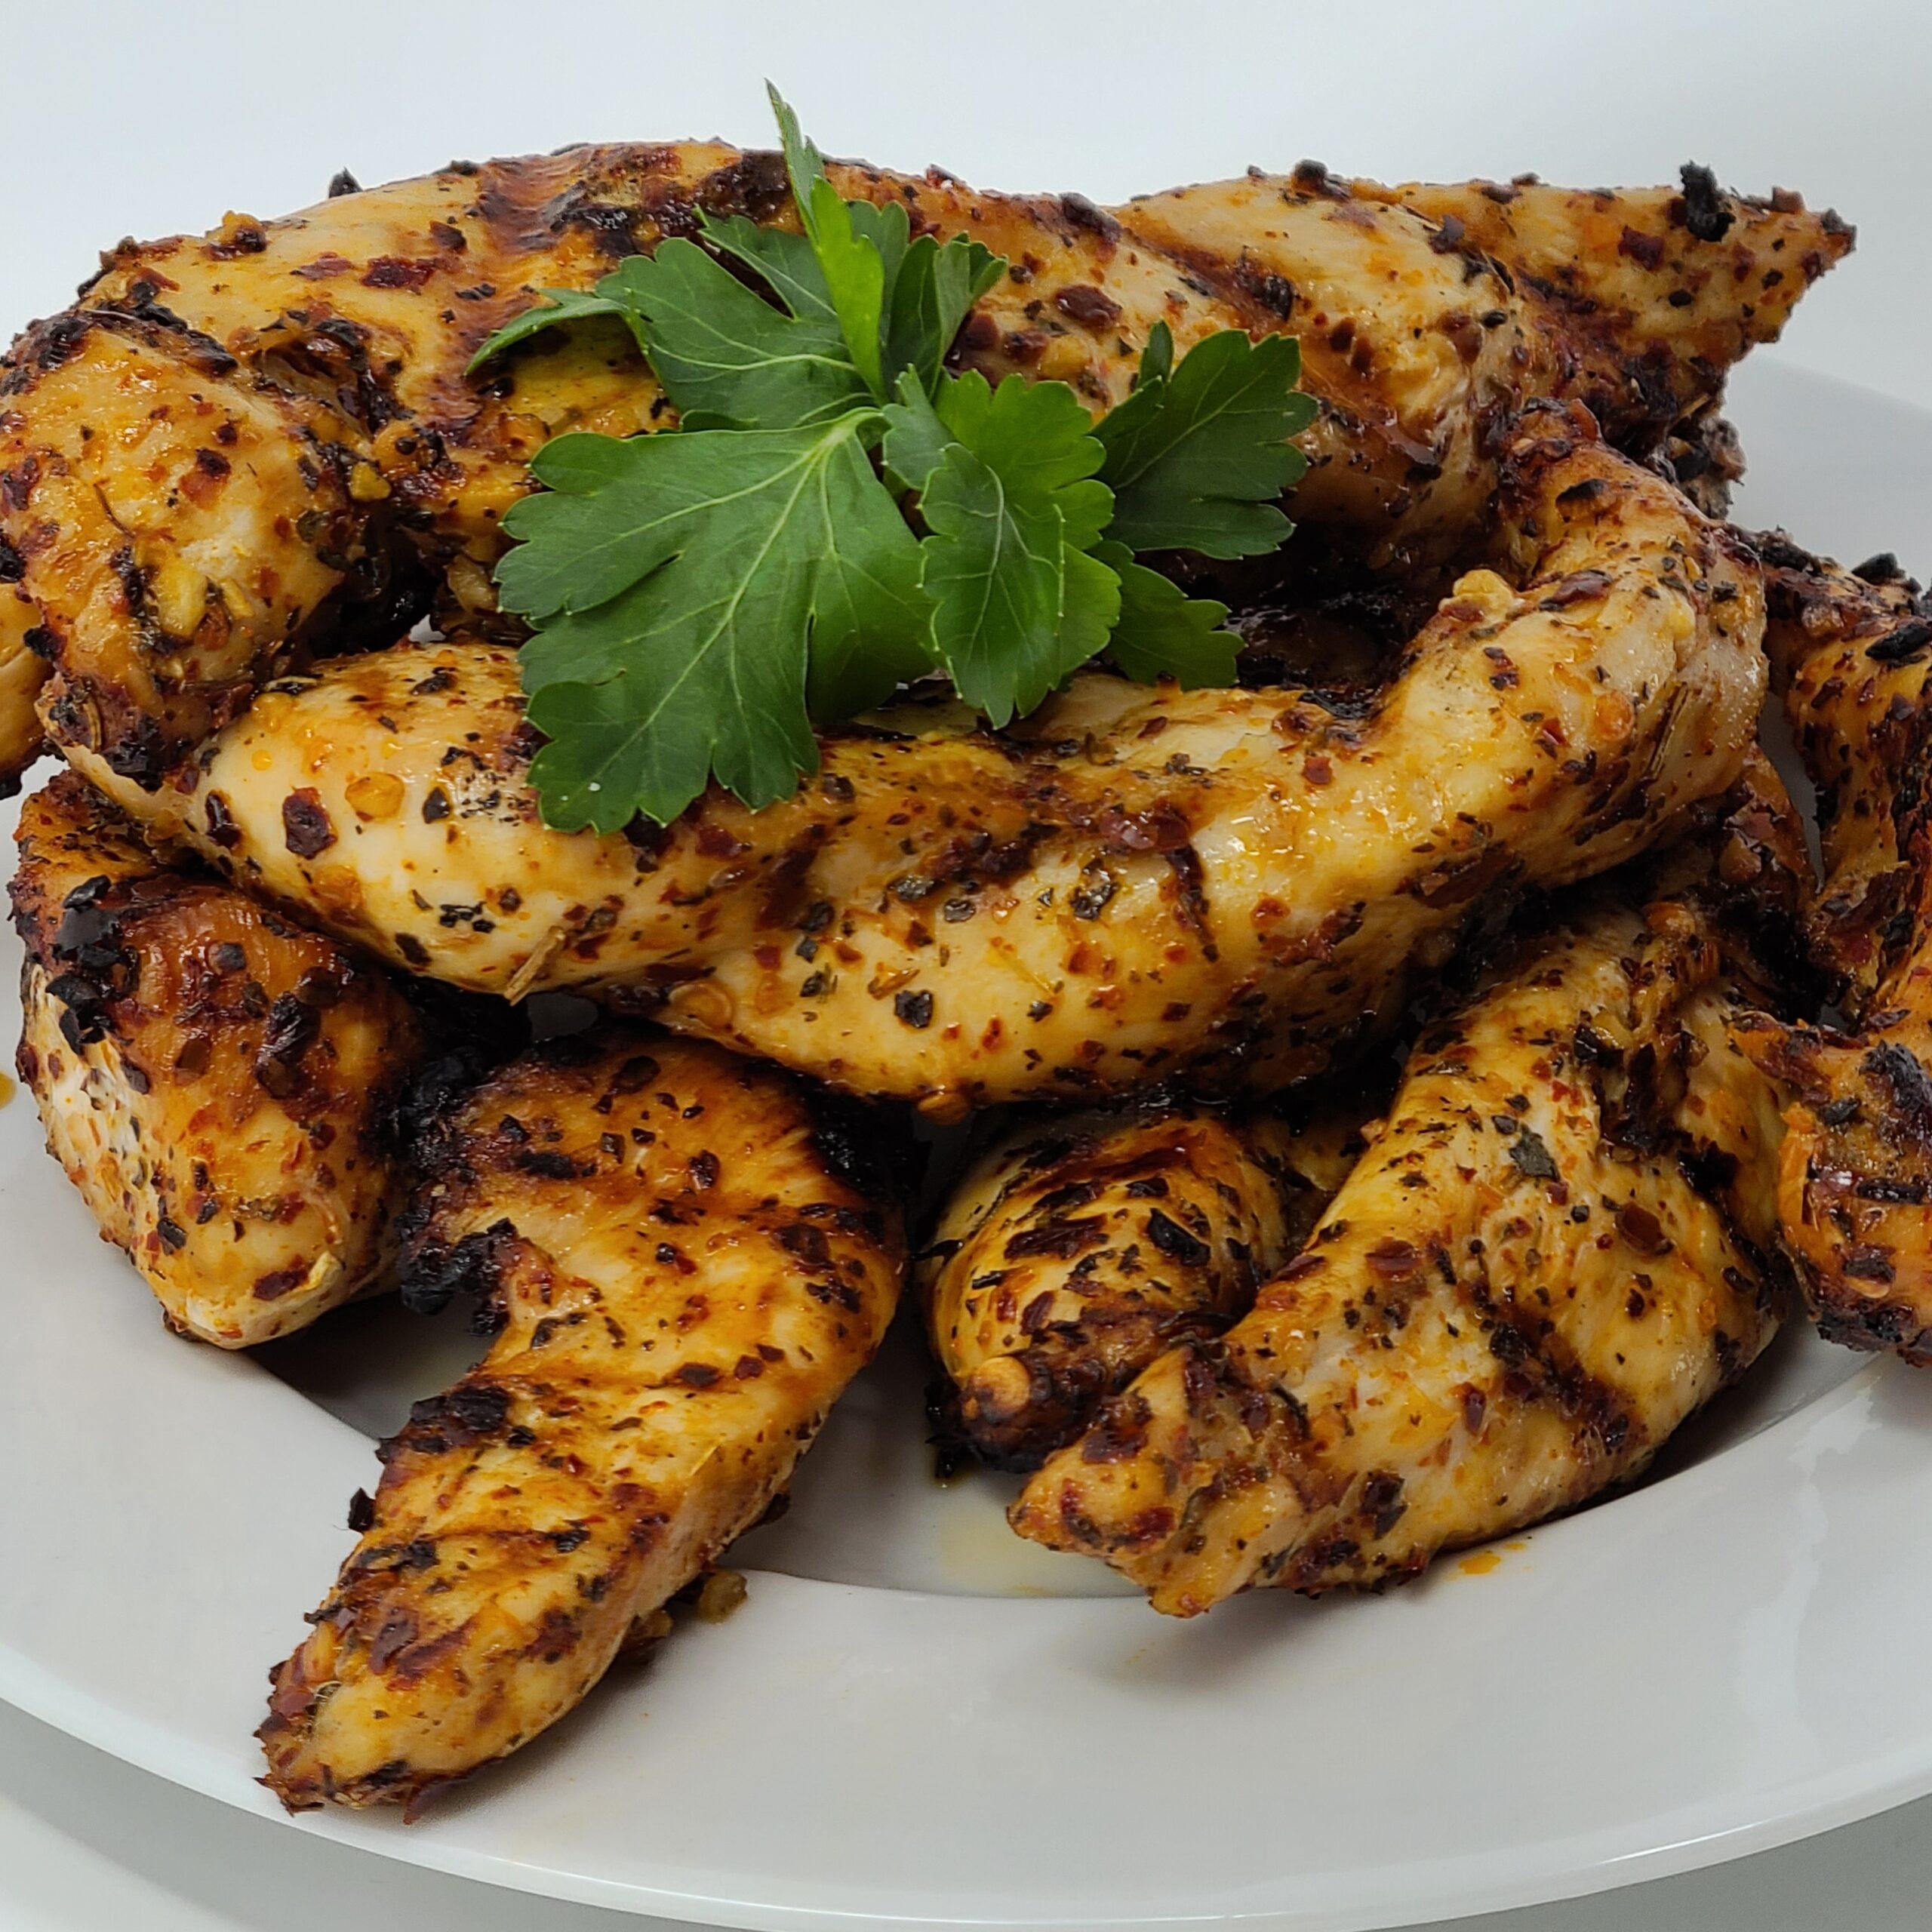 Smoky BBQ Grilled Chicken